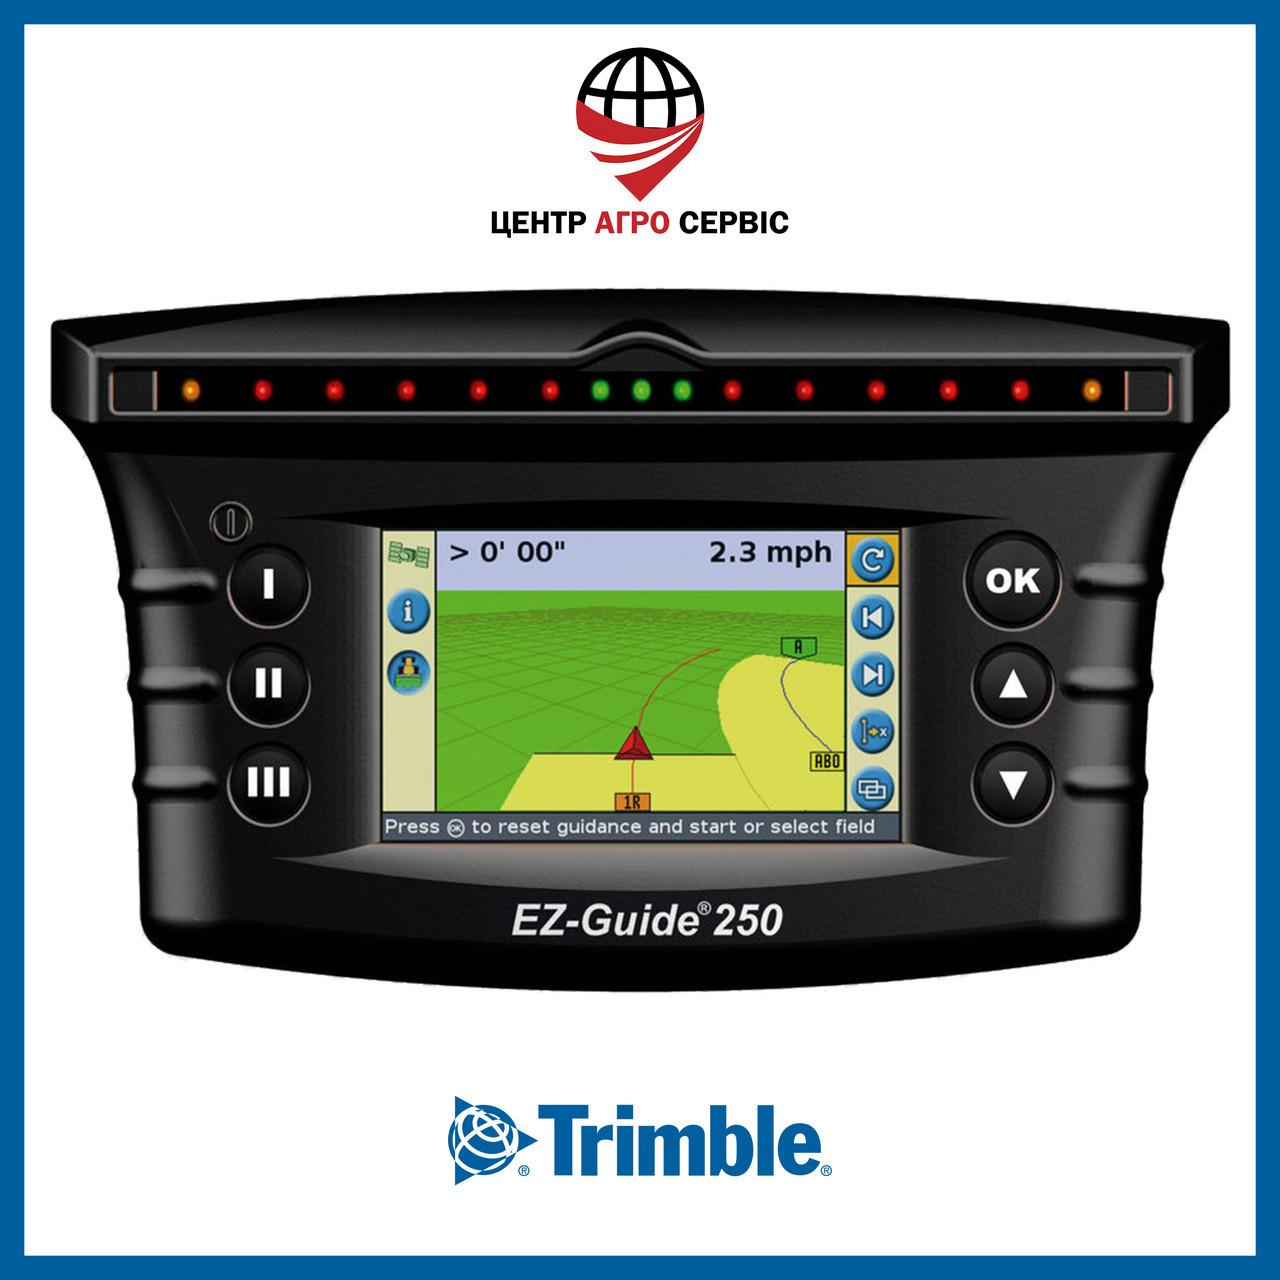 Gps навигатор для трактора (навигатор для поля, сельхоз навигатор)  Trimble EZ-Guide 250 AG-15 L1